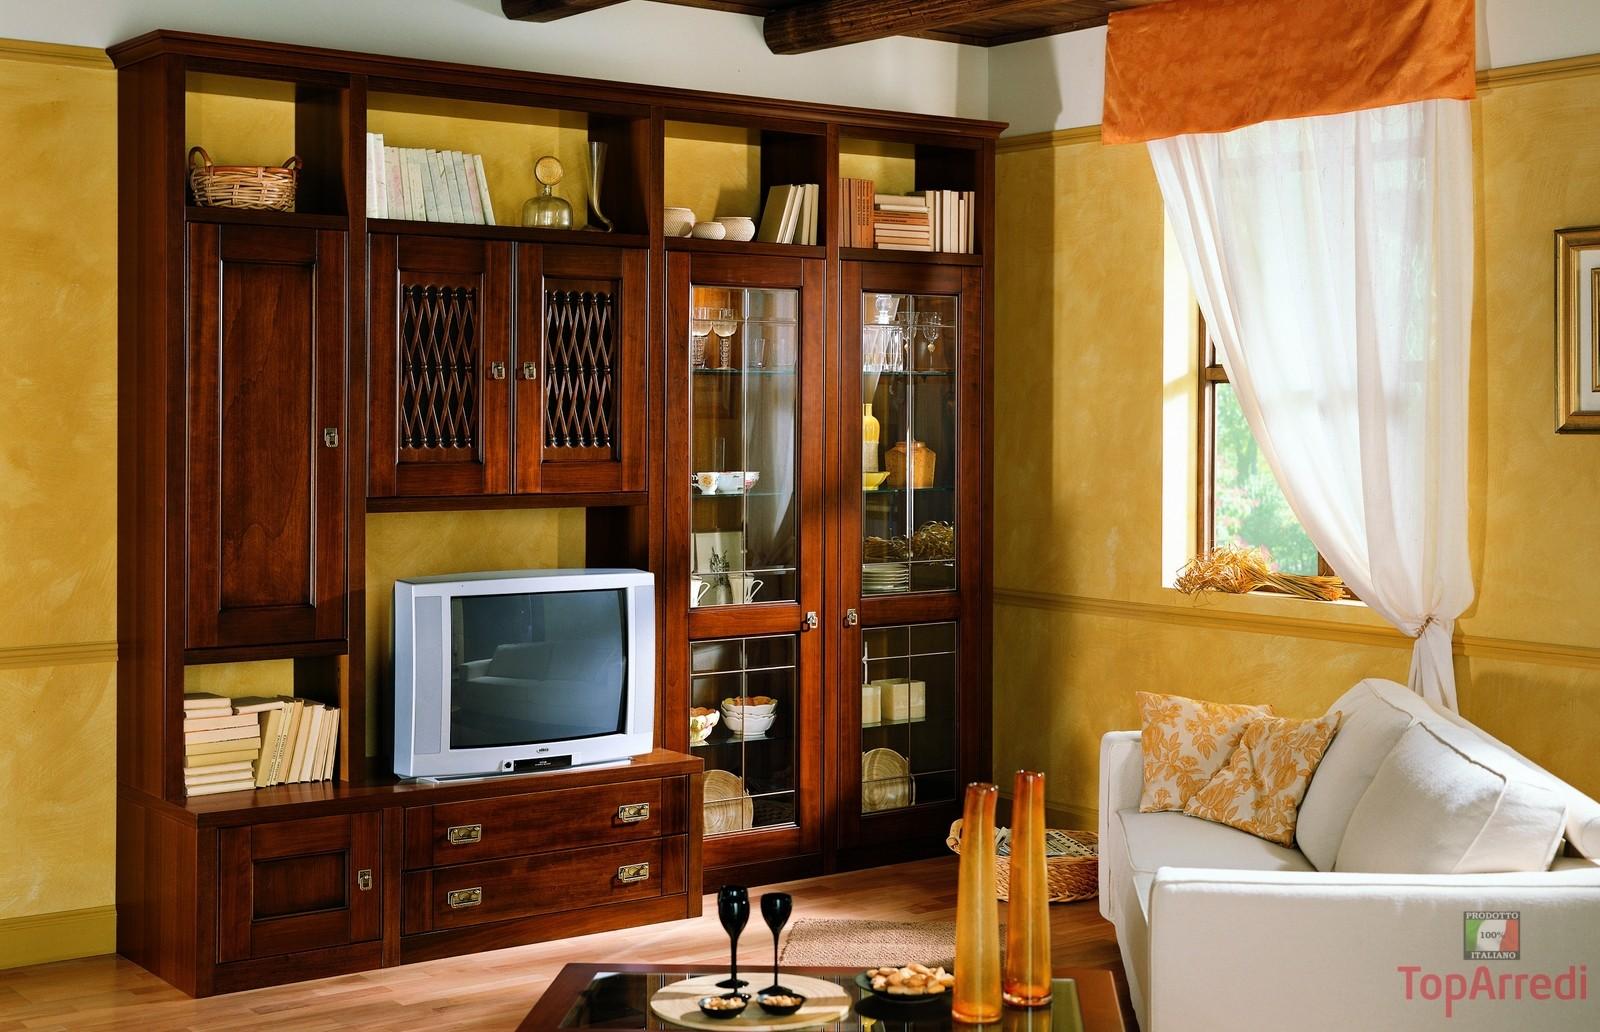 Arredamento e mobili online: ottobre 2012